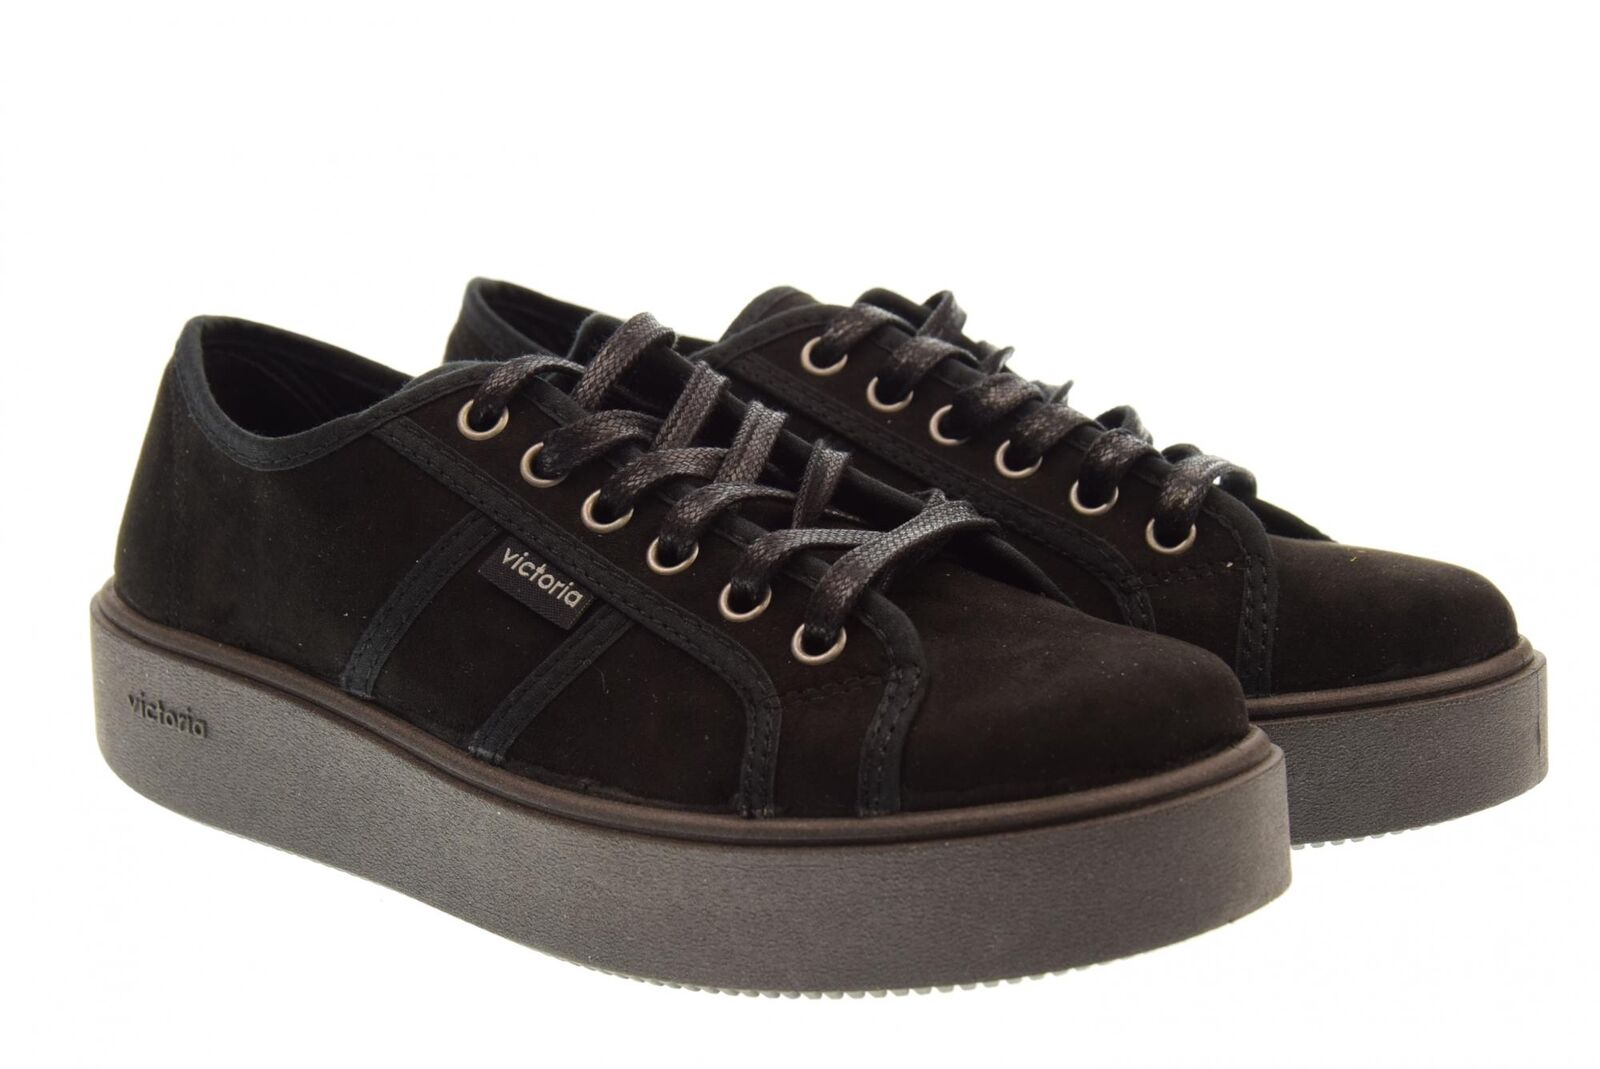 Victoria A18u Chaussures Femme Low Baskets Avec Plate-forme 1260116